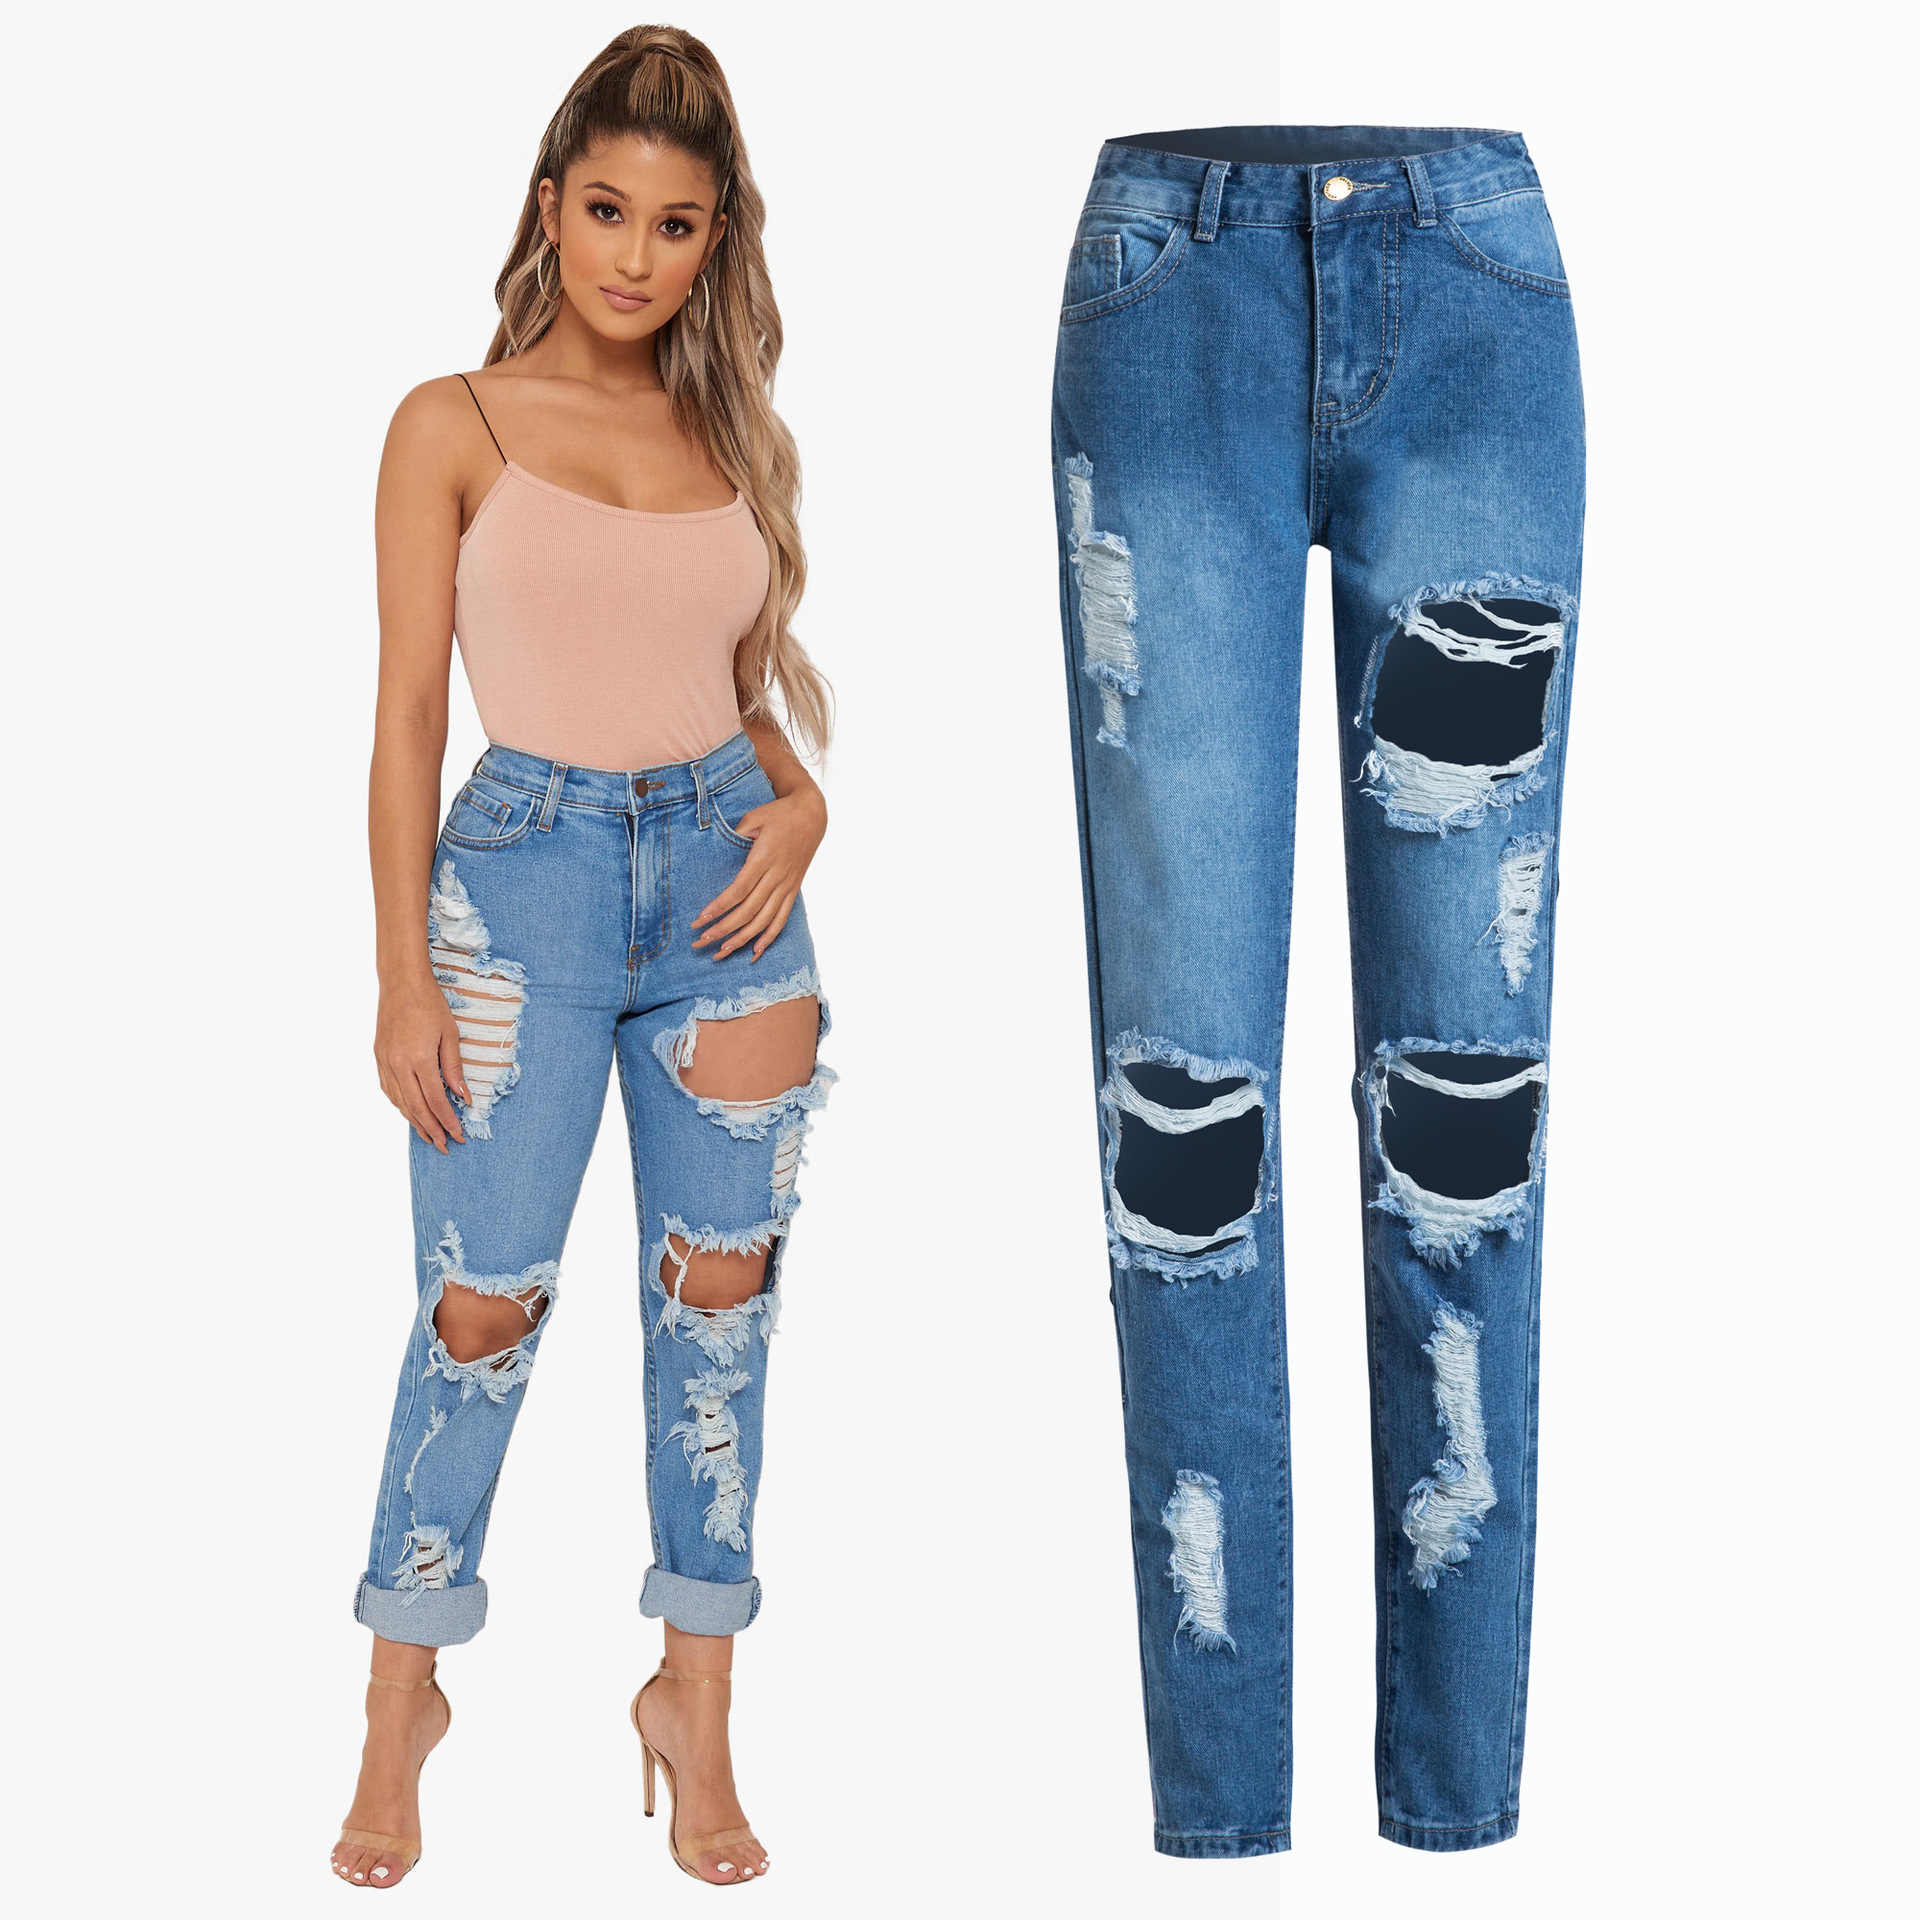 Pantalones Vaqueros Mujer Pantalones Vaqueros Ajustados Pantalones Cortos Mujer Agujero Jeans Mujer 2019 Pantalones Vaqueros Calientes Wmoen Jeans Moda Aliexpress